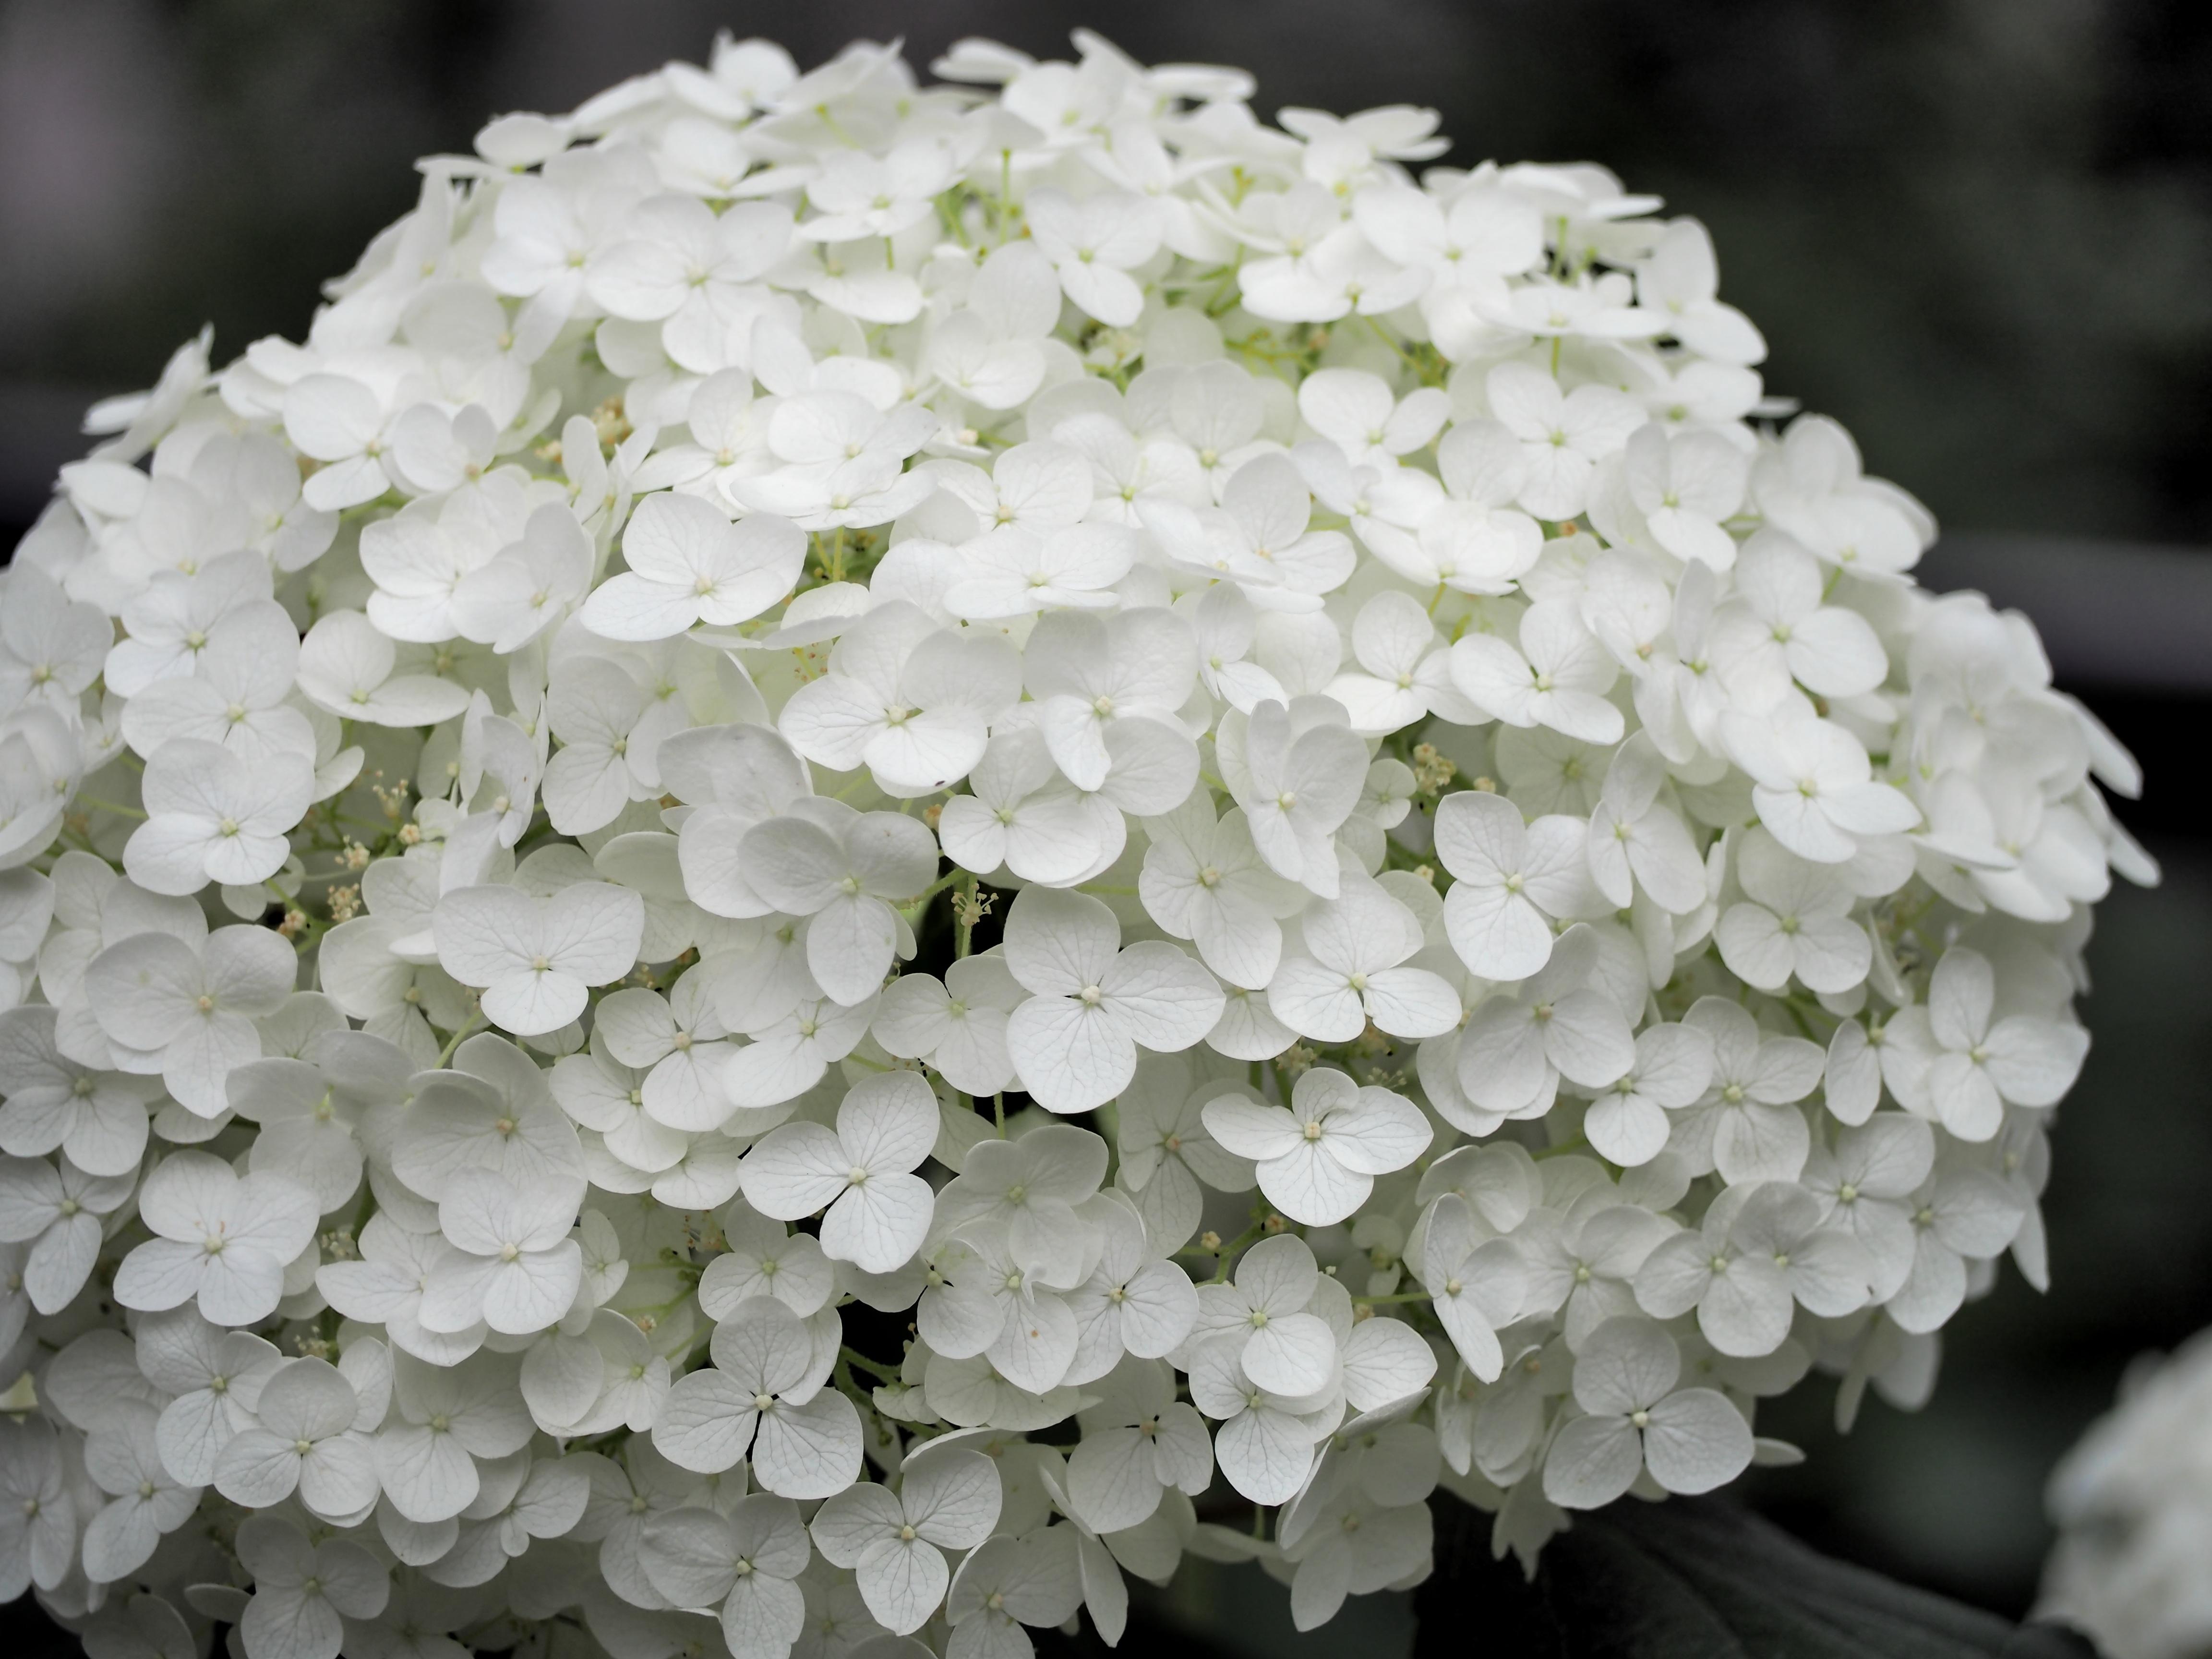 Free Images Flower Petal Hydrangea Viburnum White Flowers